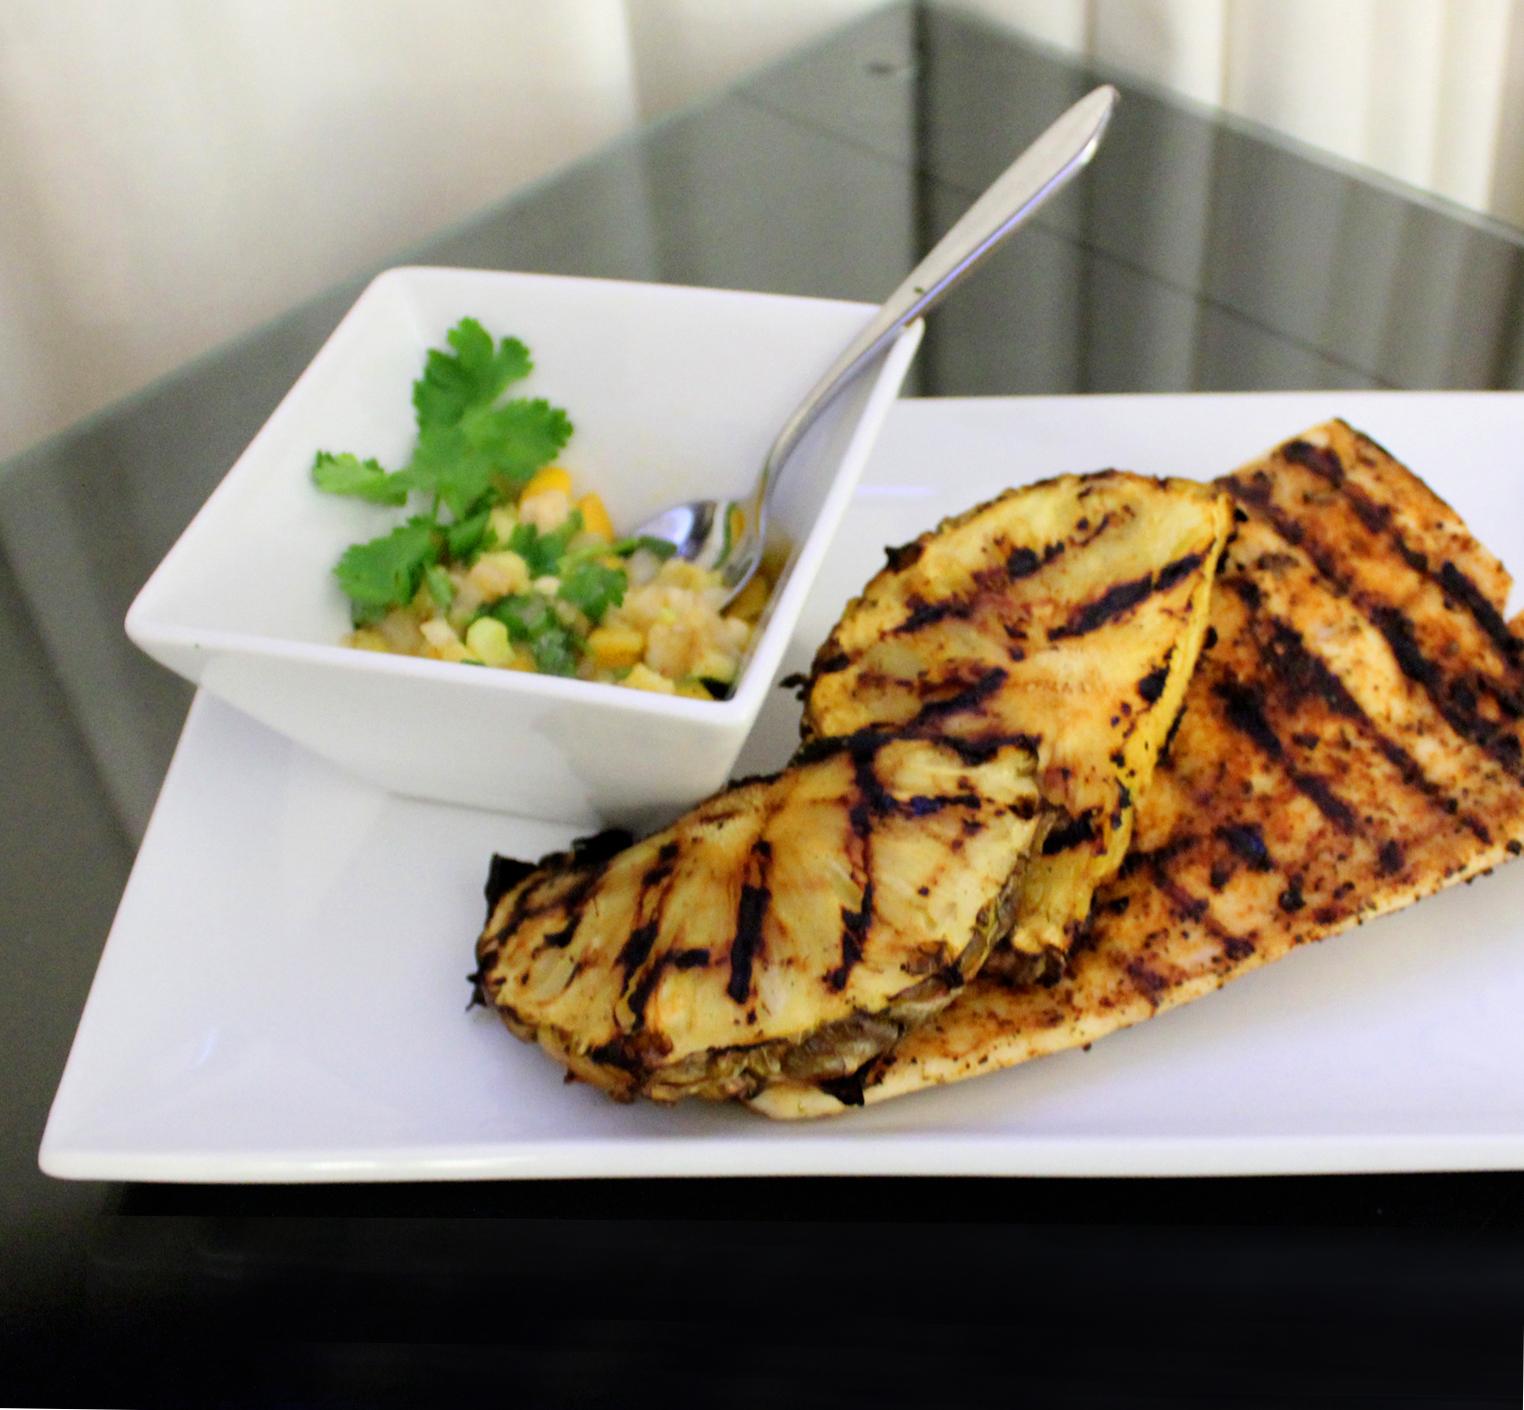 amberjack fish recipe, midlife snowbird, mango salsa